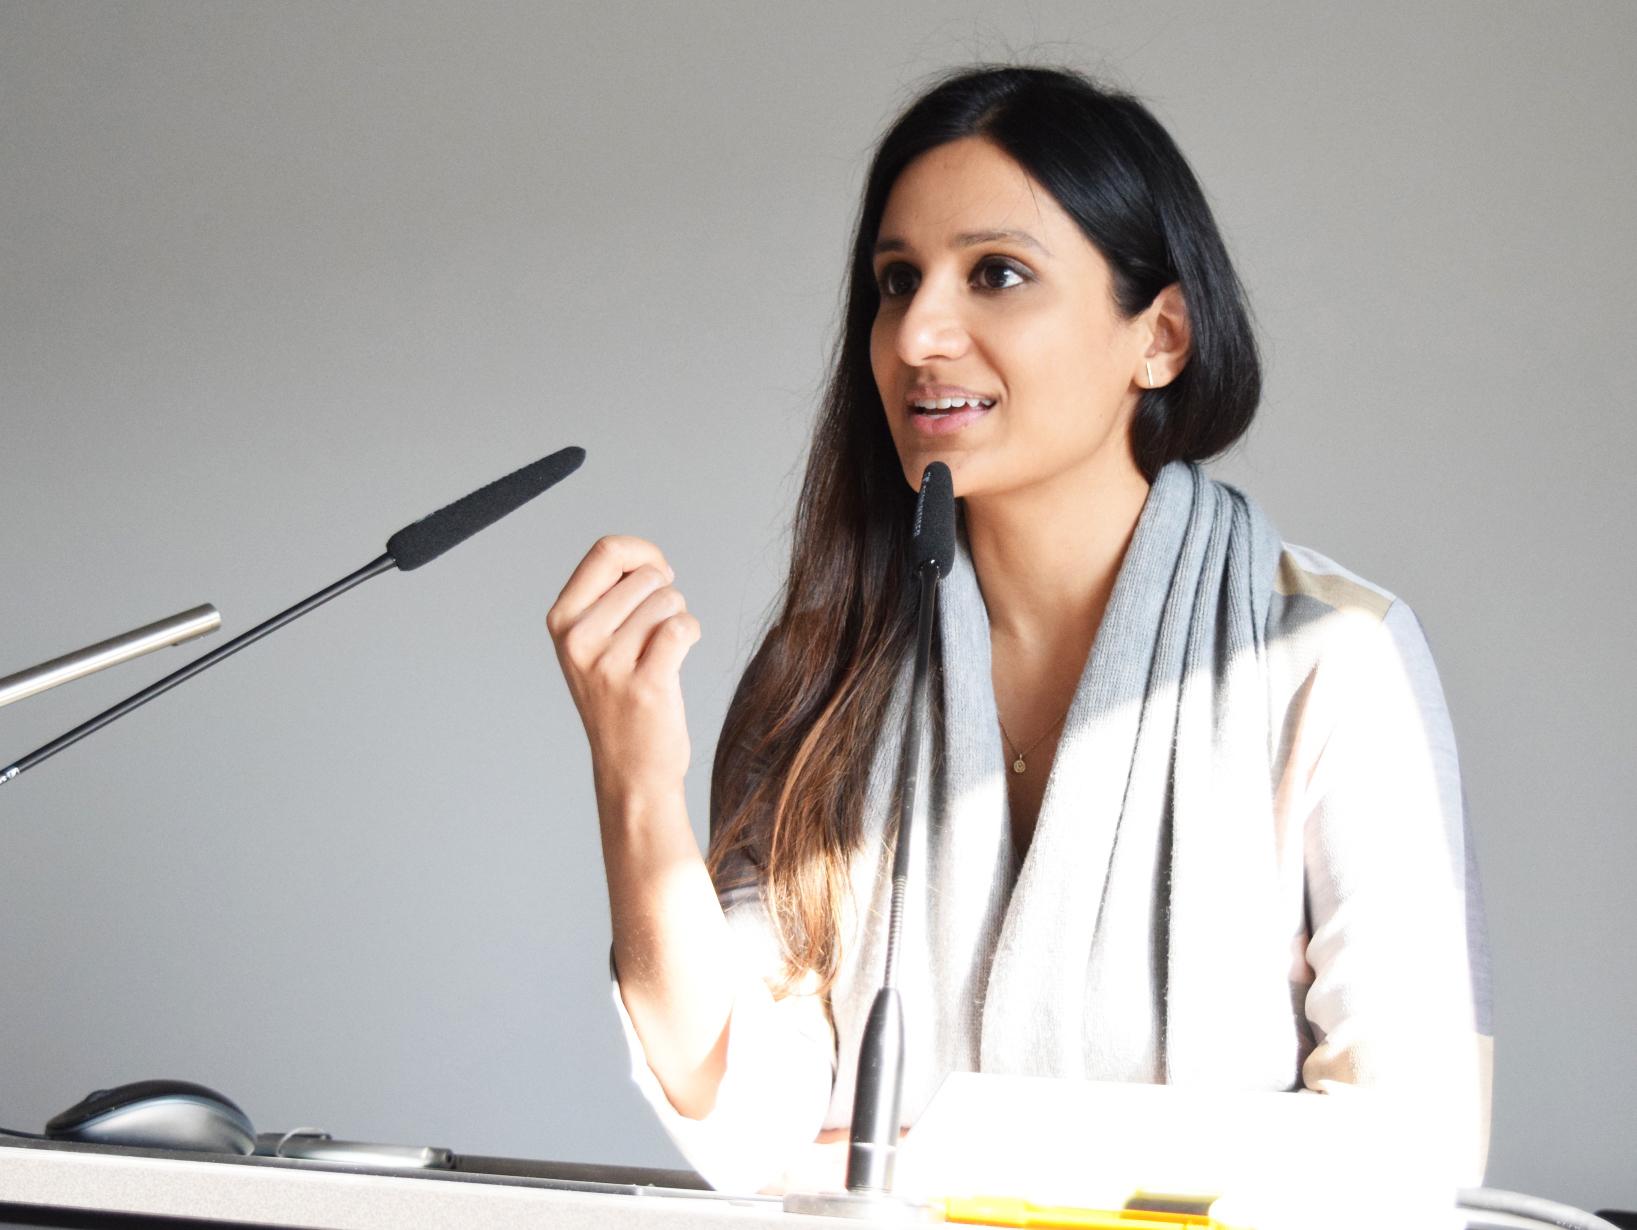 Saima Akhtar (Photo: Lucy Charman under CC BY-NC-SA 4.0)